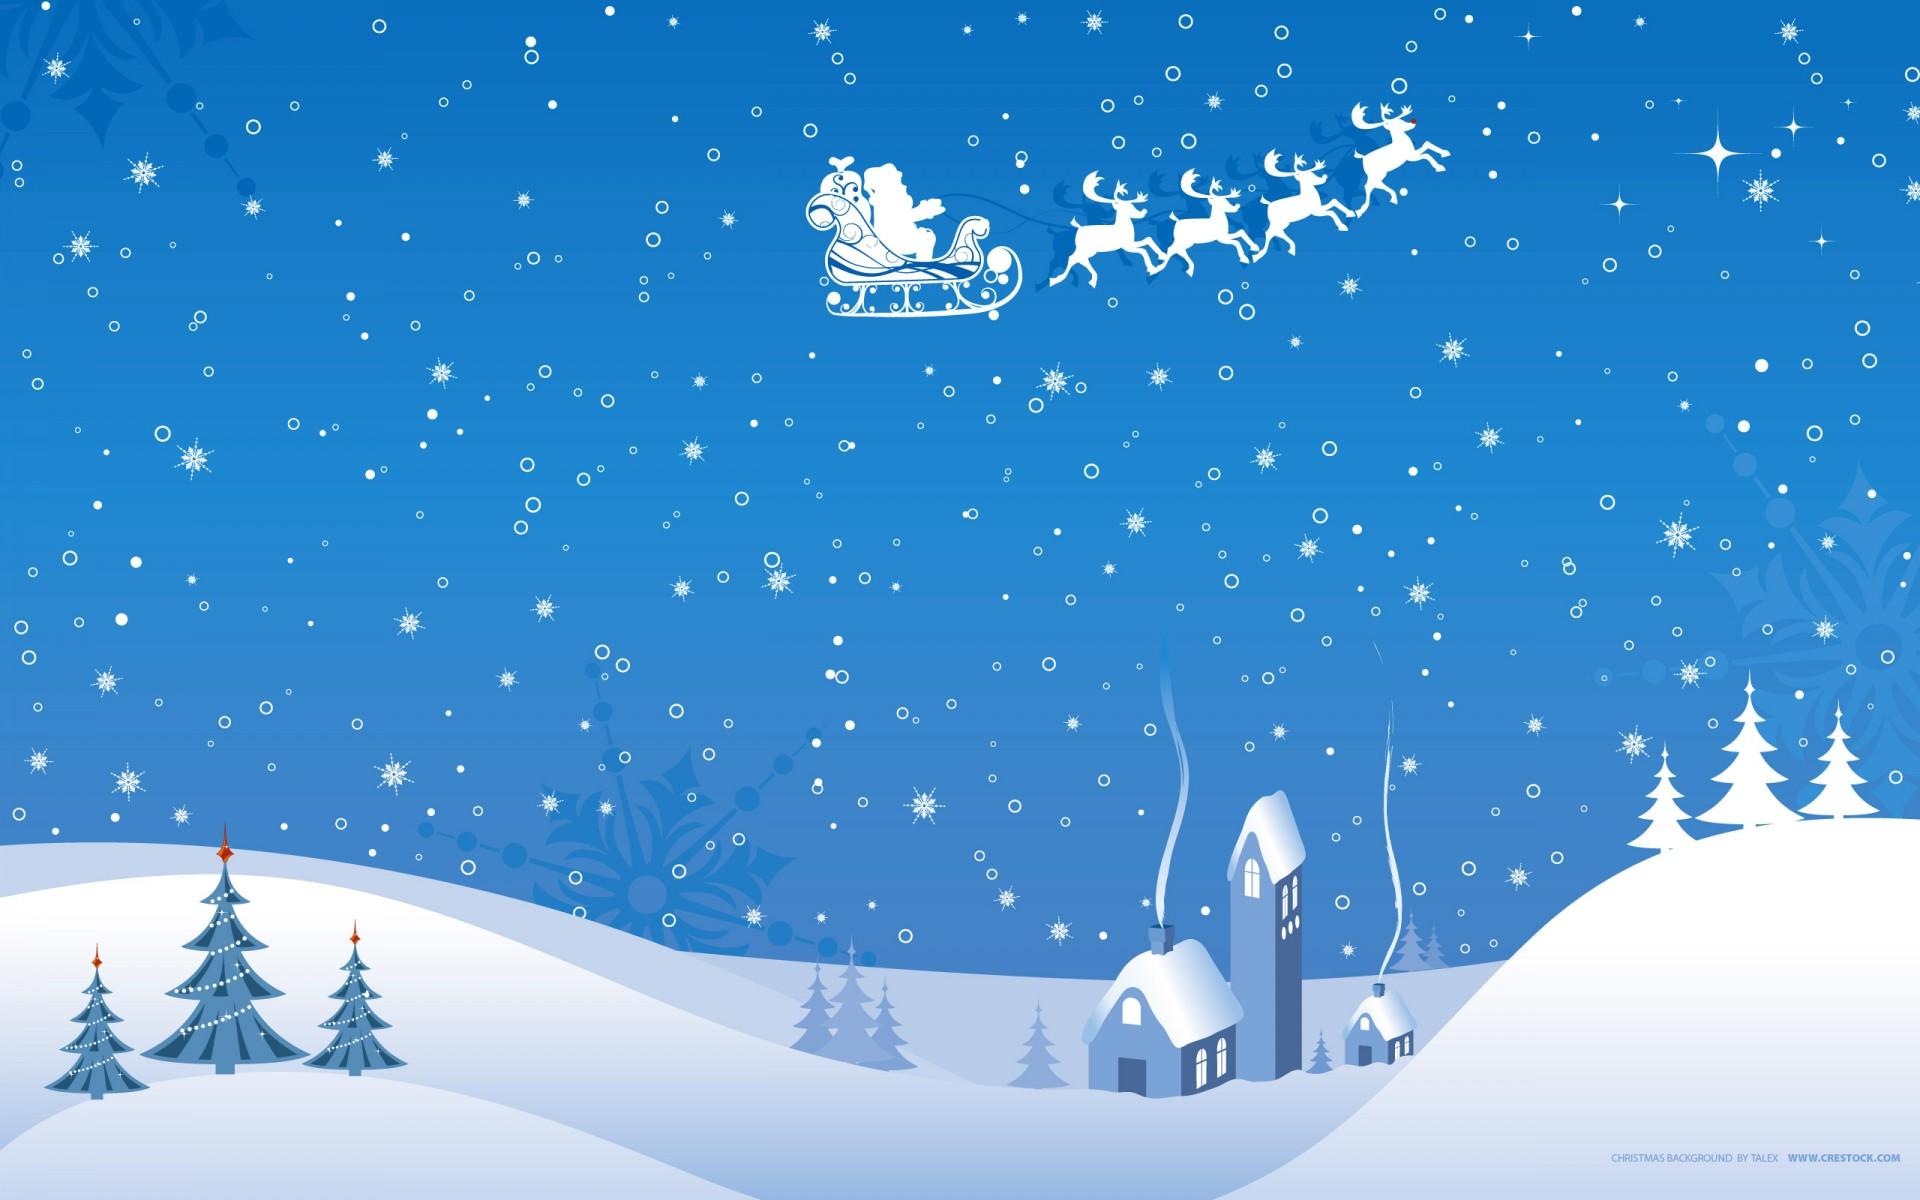 Merry Christmas Desktop Wallpaper 3d Christmas Winter Vector Wallpapers Hd Wallpapers Id 4771